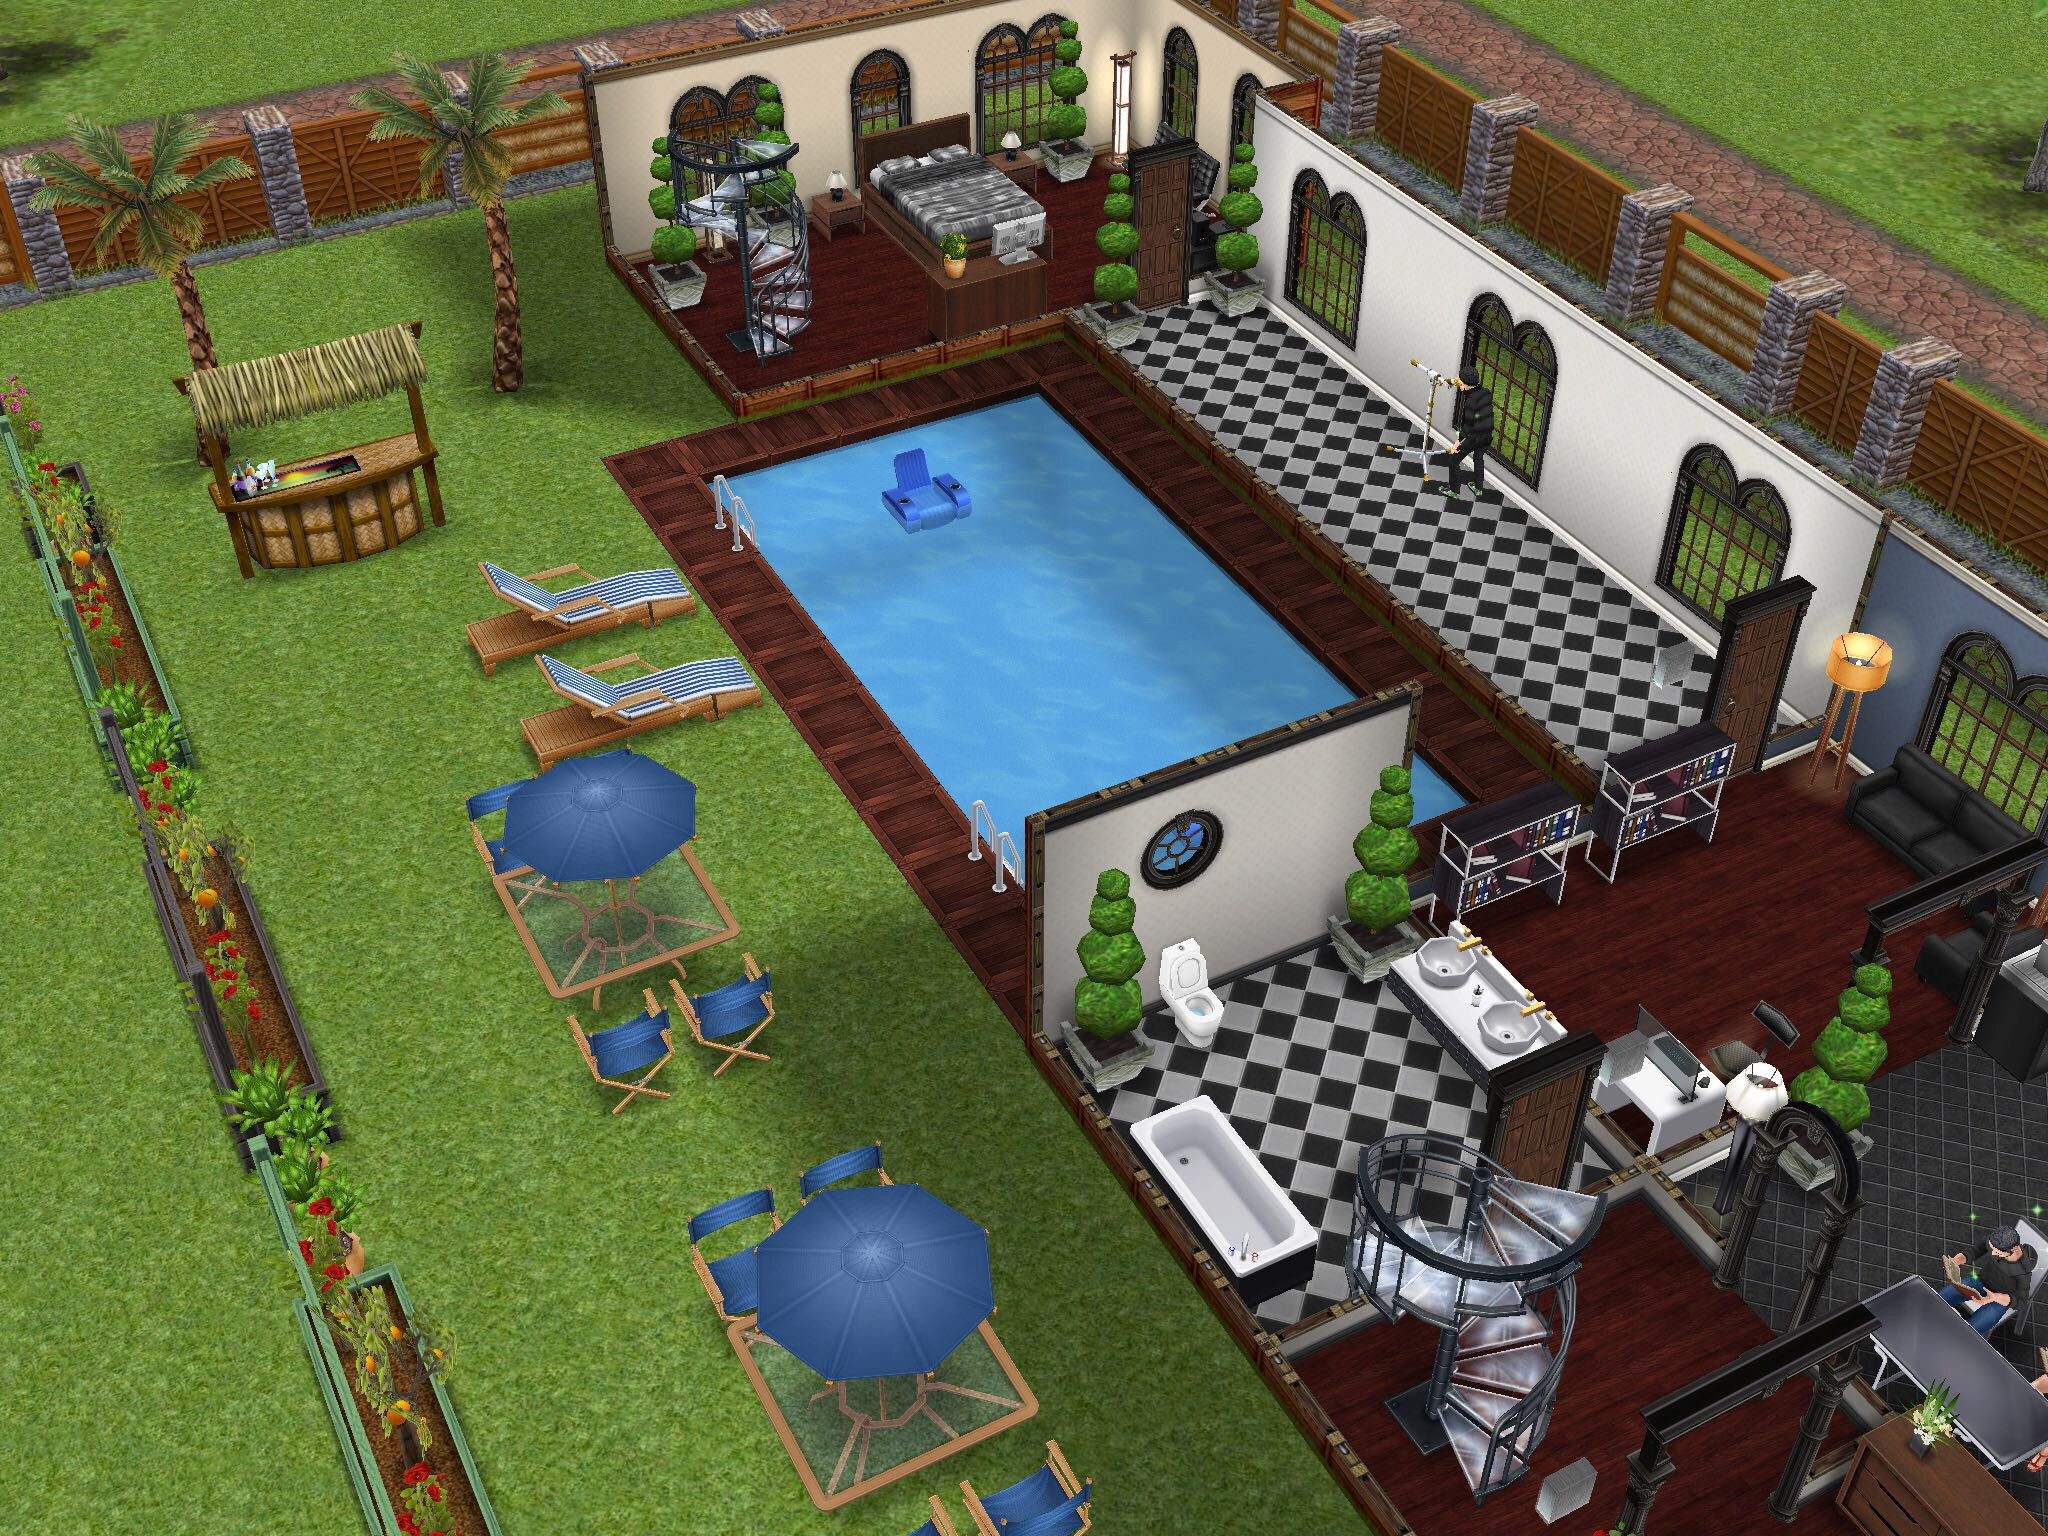 backyard/pool design idea   sims freeplay house design ideas